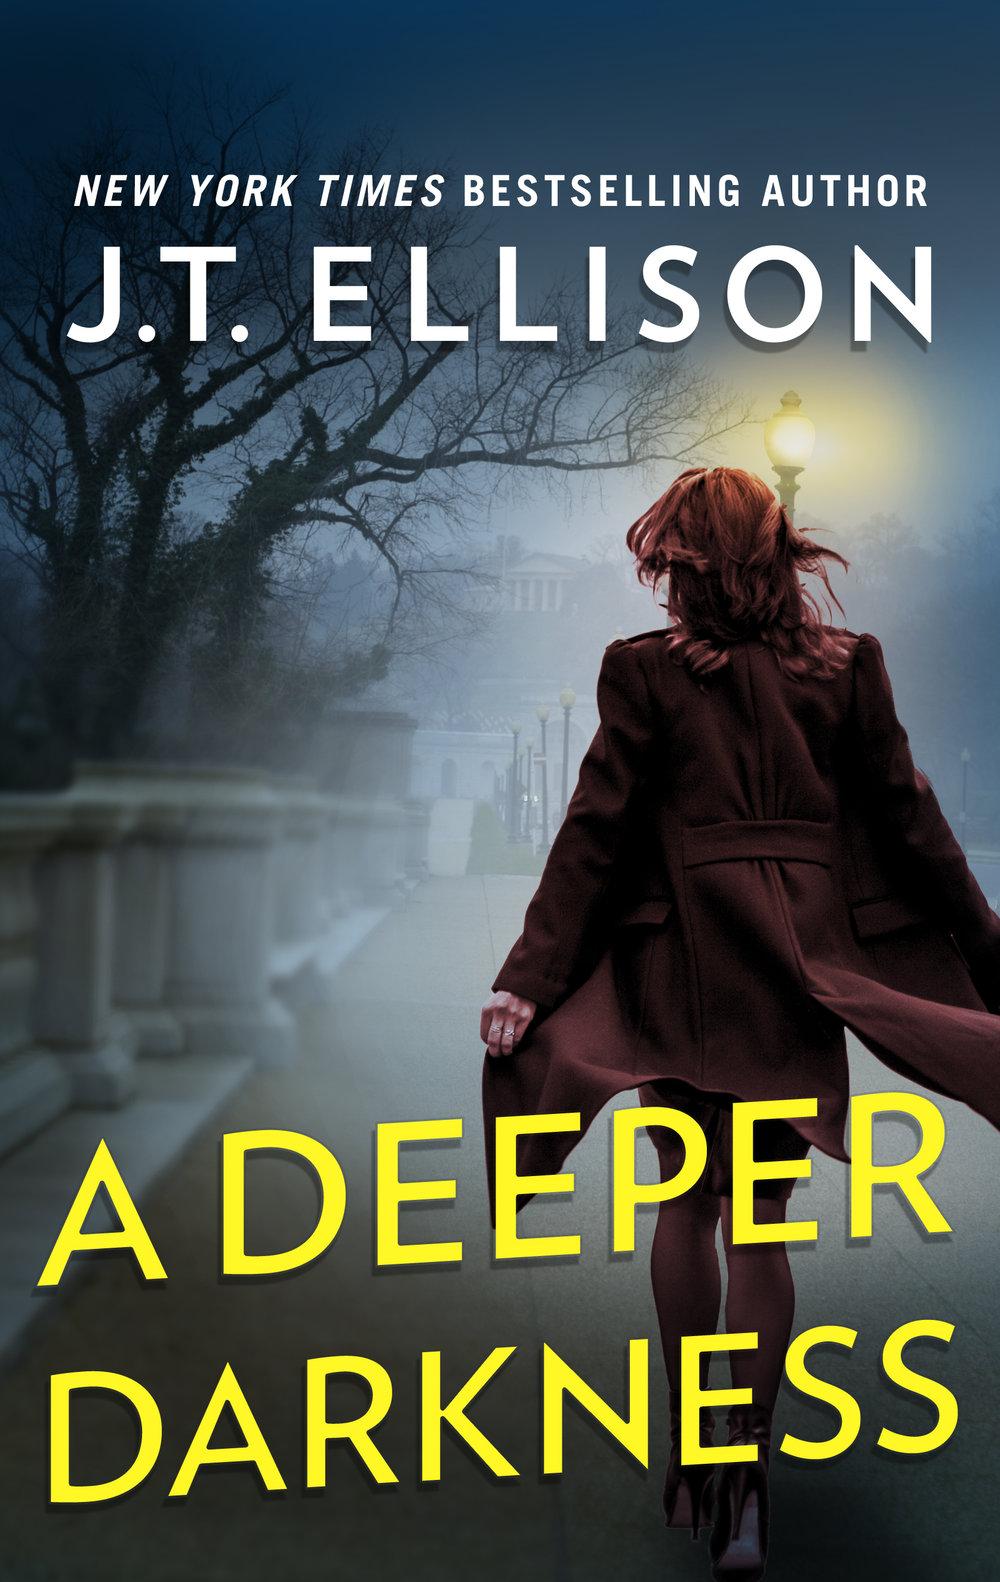 #1: A Deeper Darkness